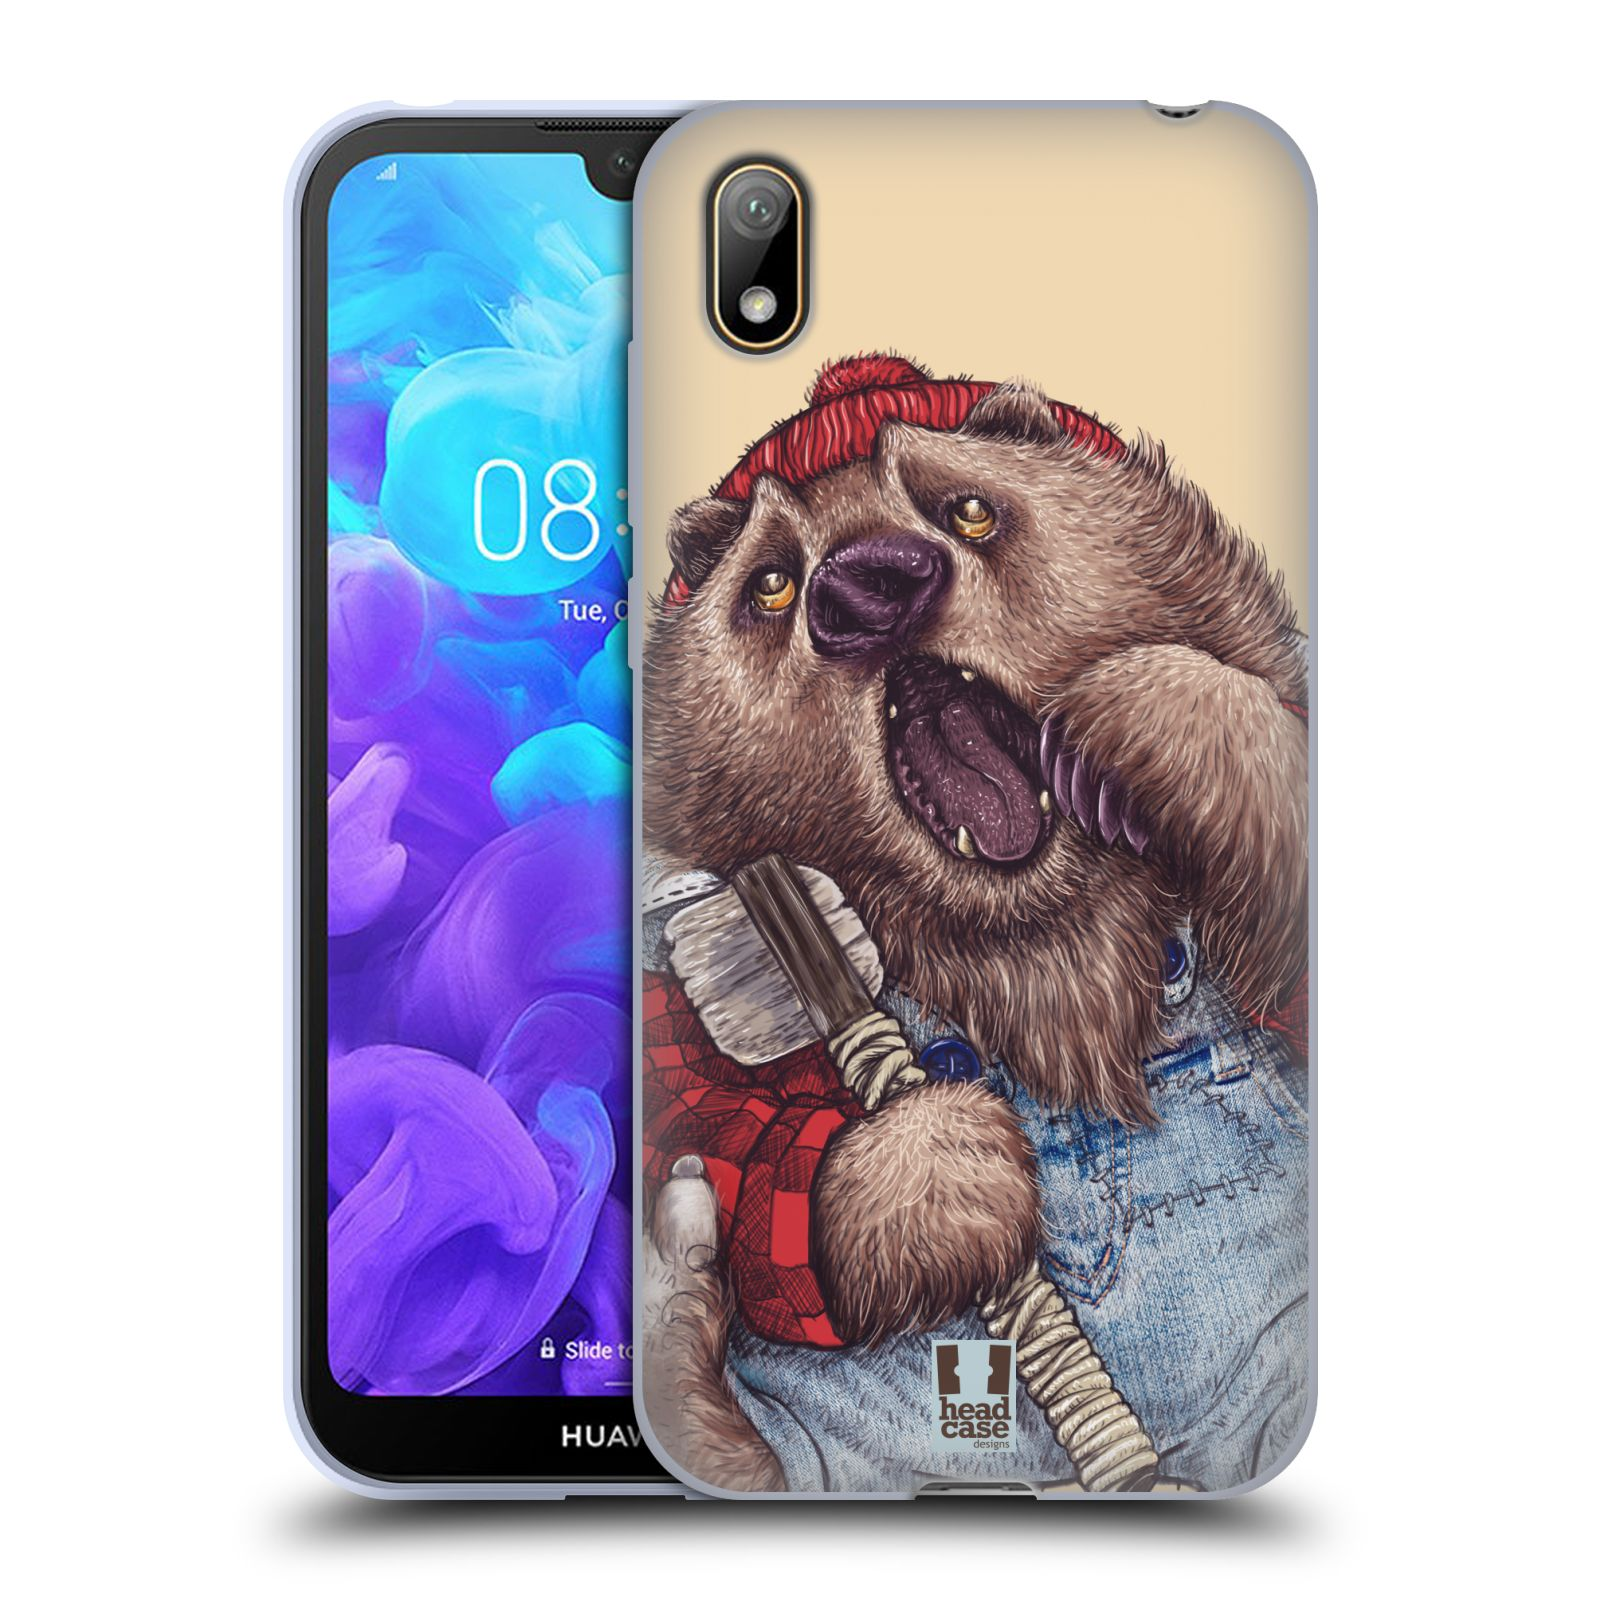 Silikonové pouzdro na mobil Huawei Y5 (2019) - Head Case - ANIMPLA MEDVĚD